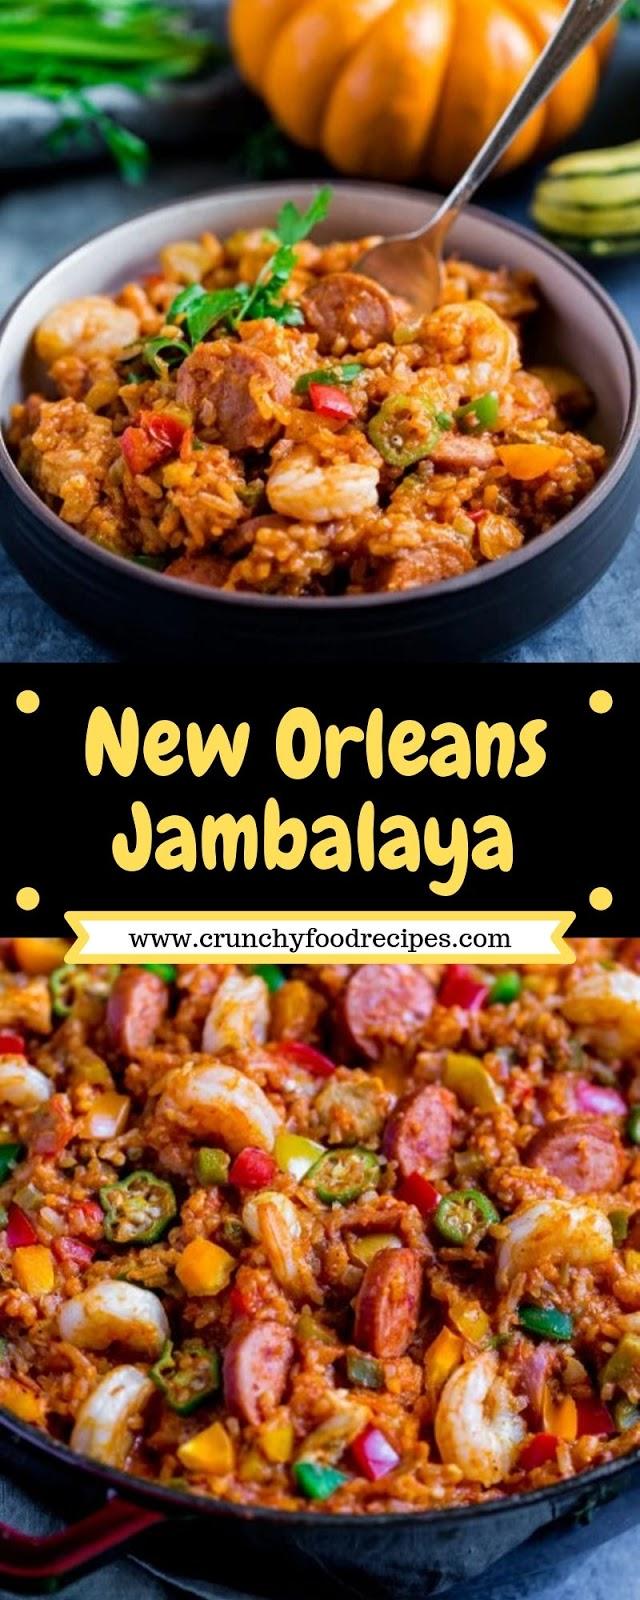 New Orleans Jambalaya